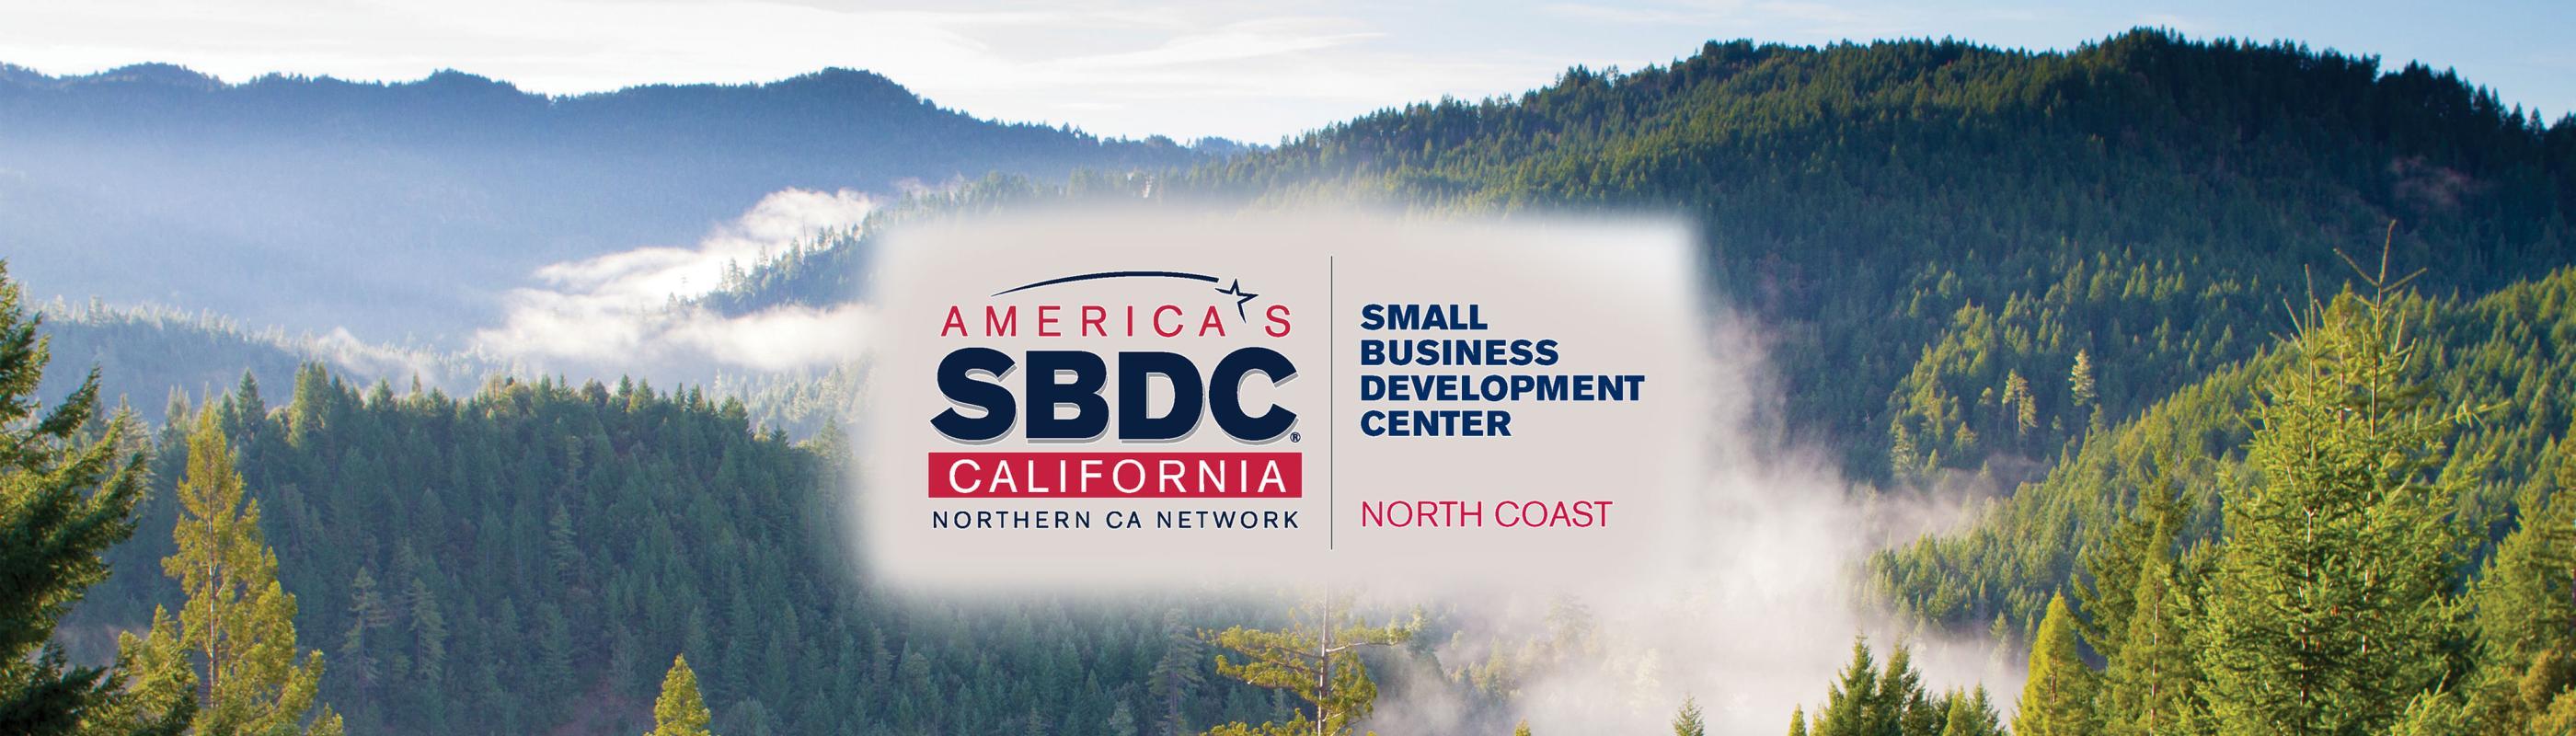 Northern California Network Small Business Development Center North Coast